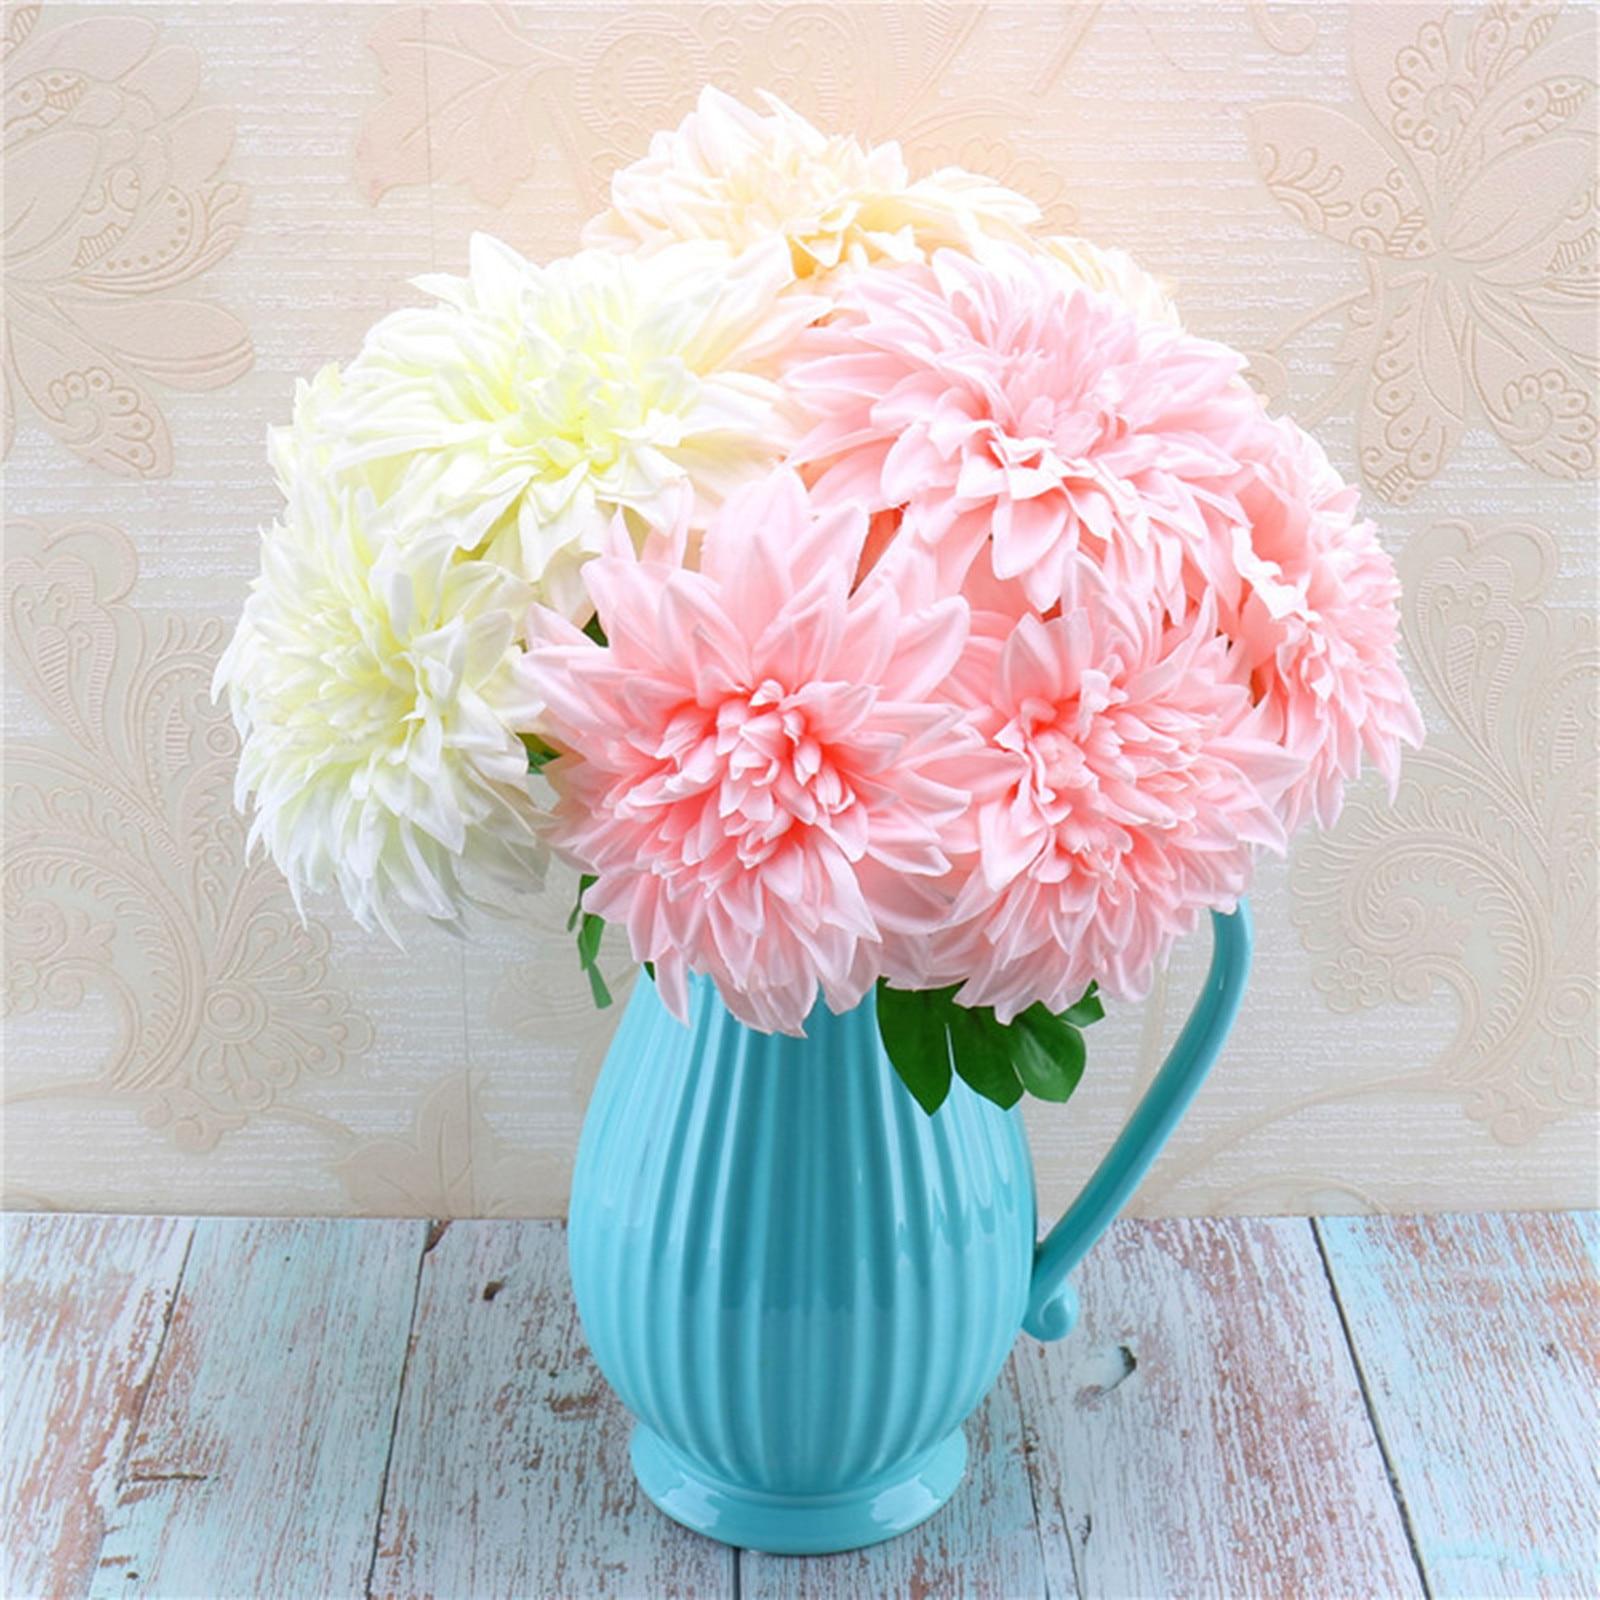 Christmas Wedding Bouquets And Flowers: Aliexpress.com : Buy 5 Head 43x12cm Dahlia Artificial Silk